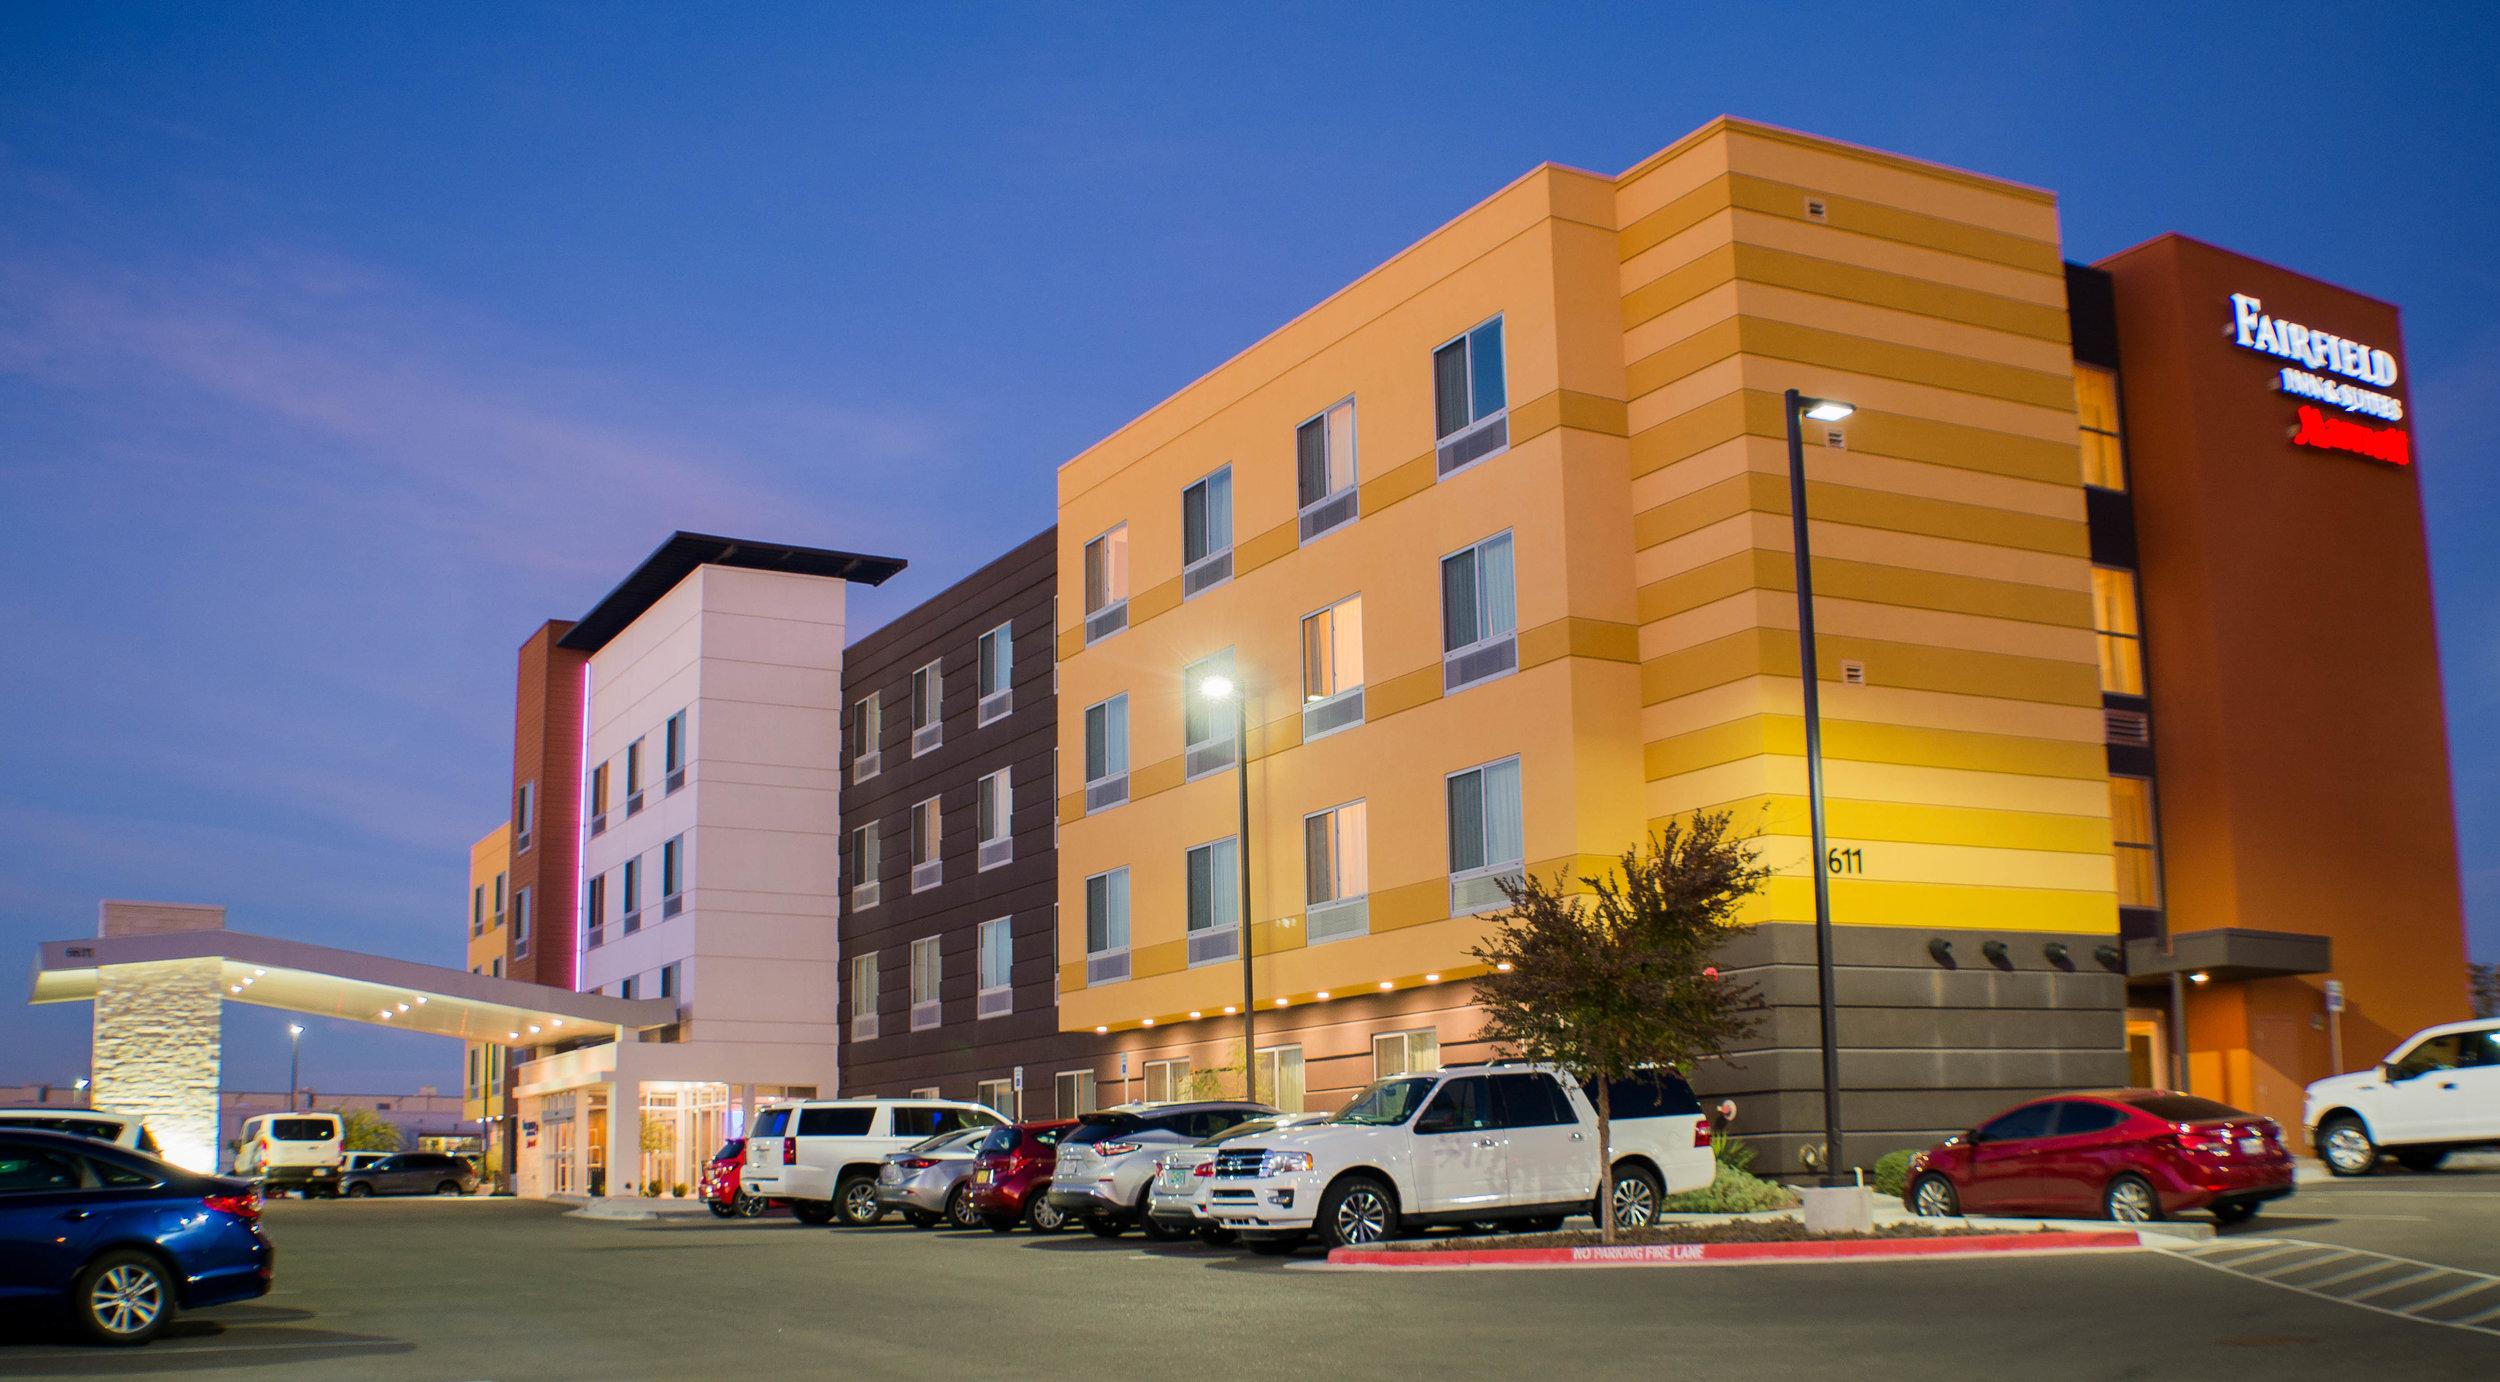 Fairfield Inn & Suites | El Paso, TX